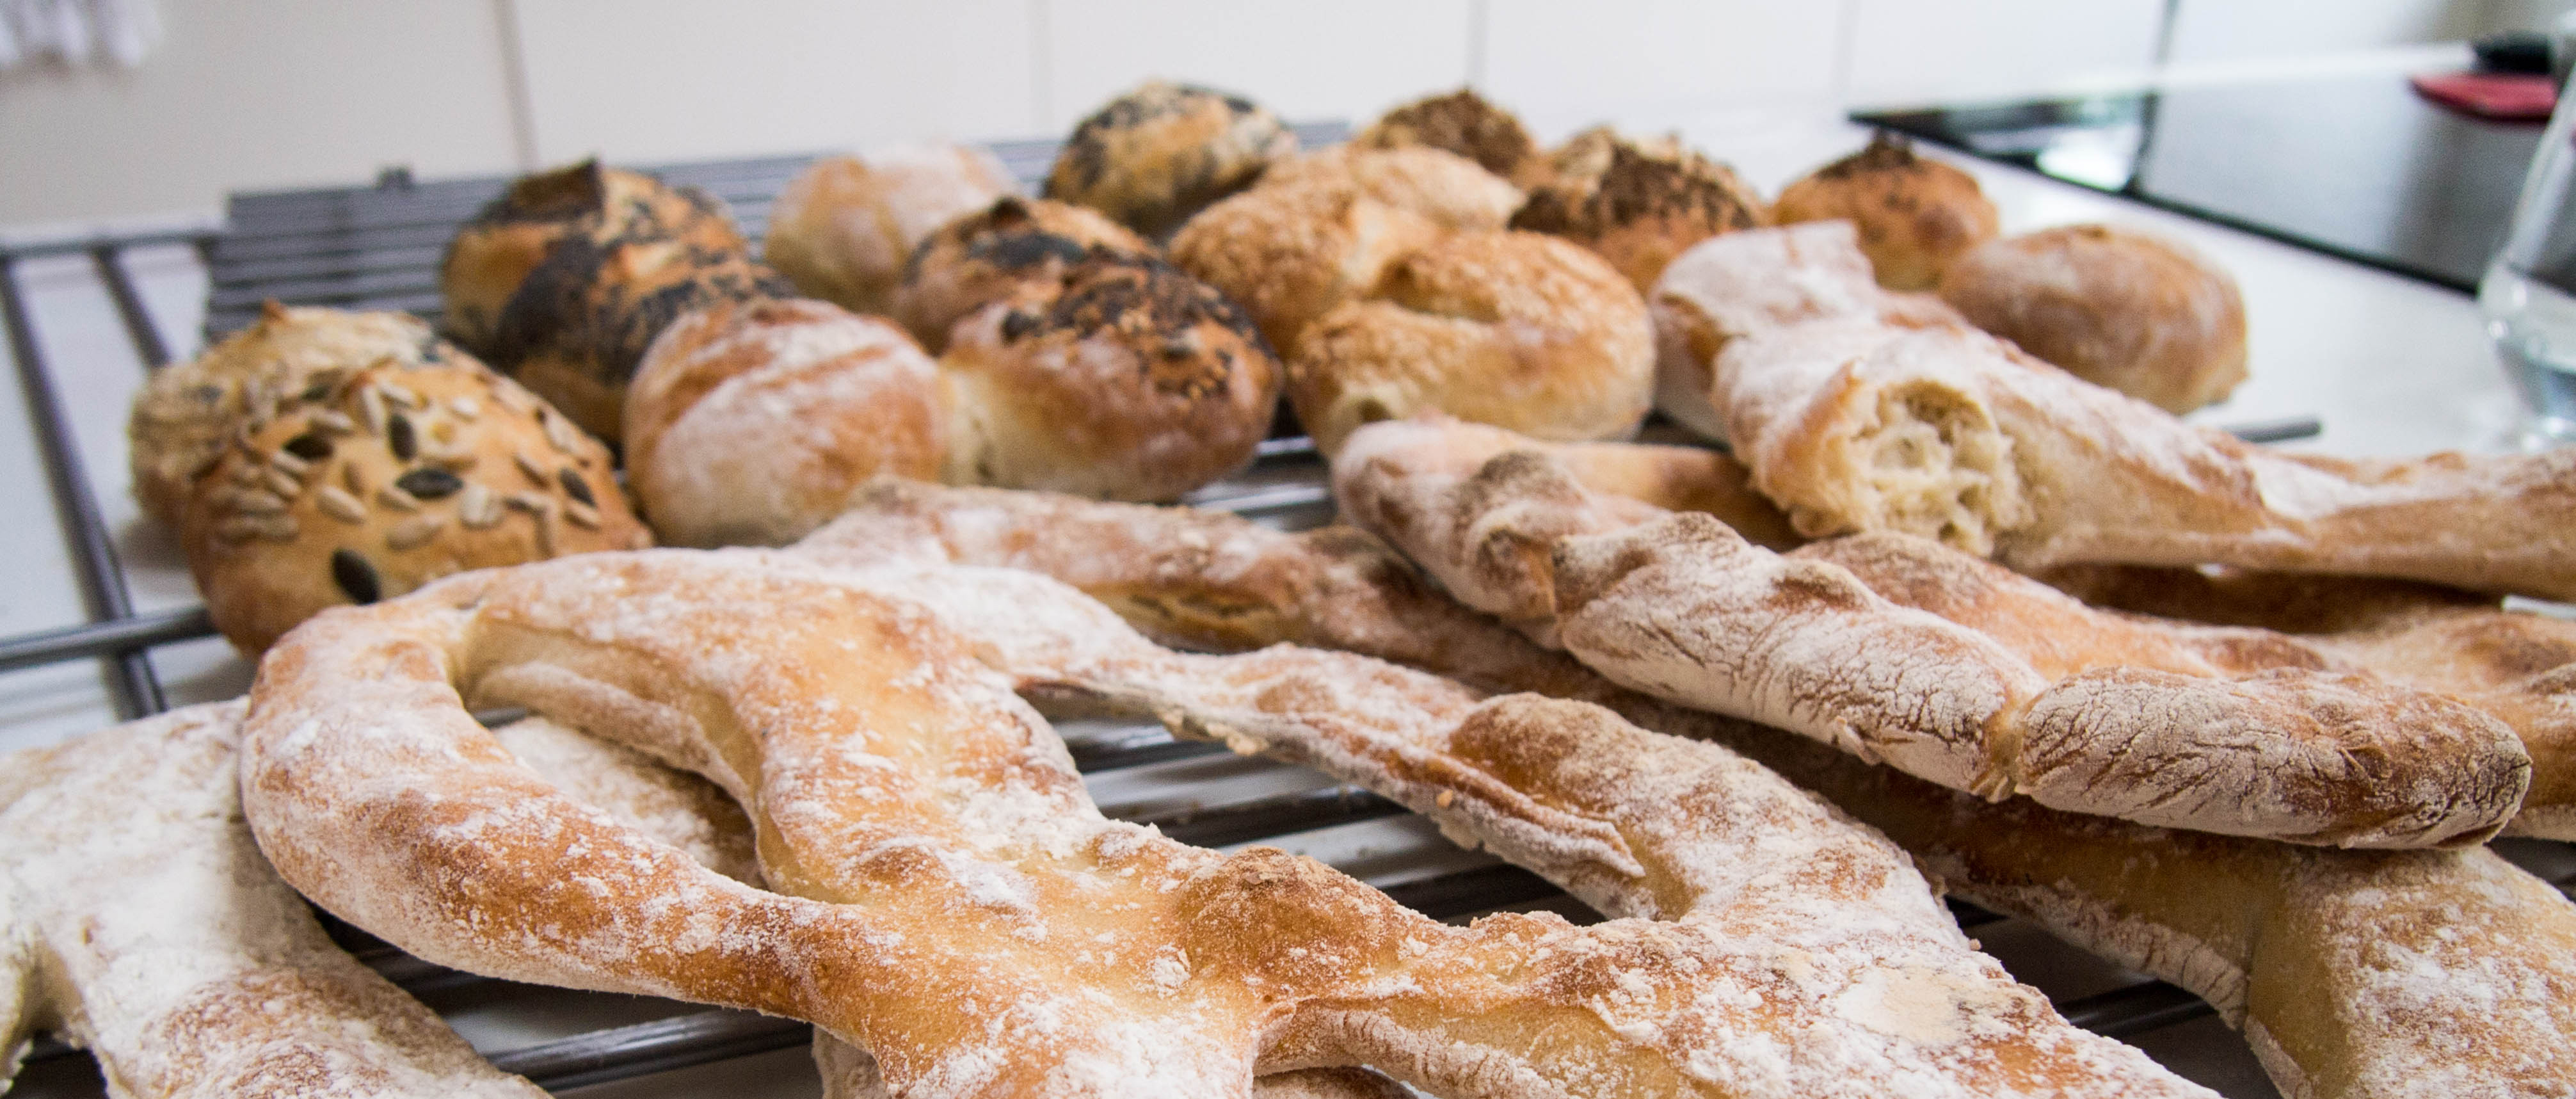 Artisan Bread Making Class by Harrington's Kitchen - food in London